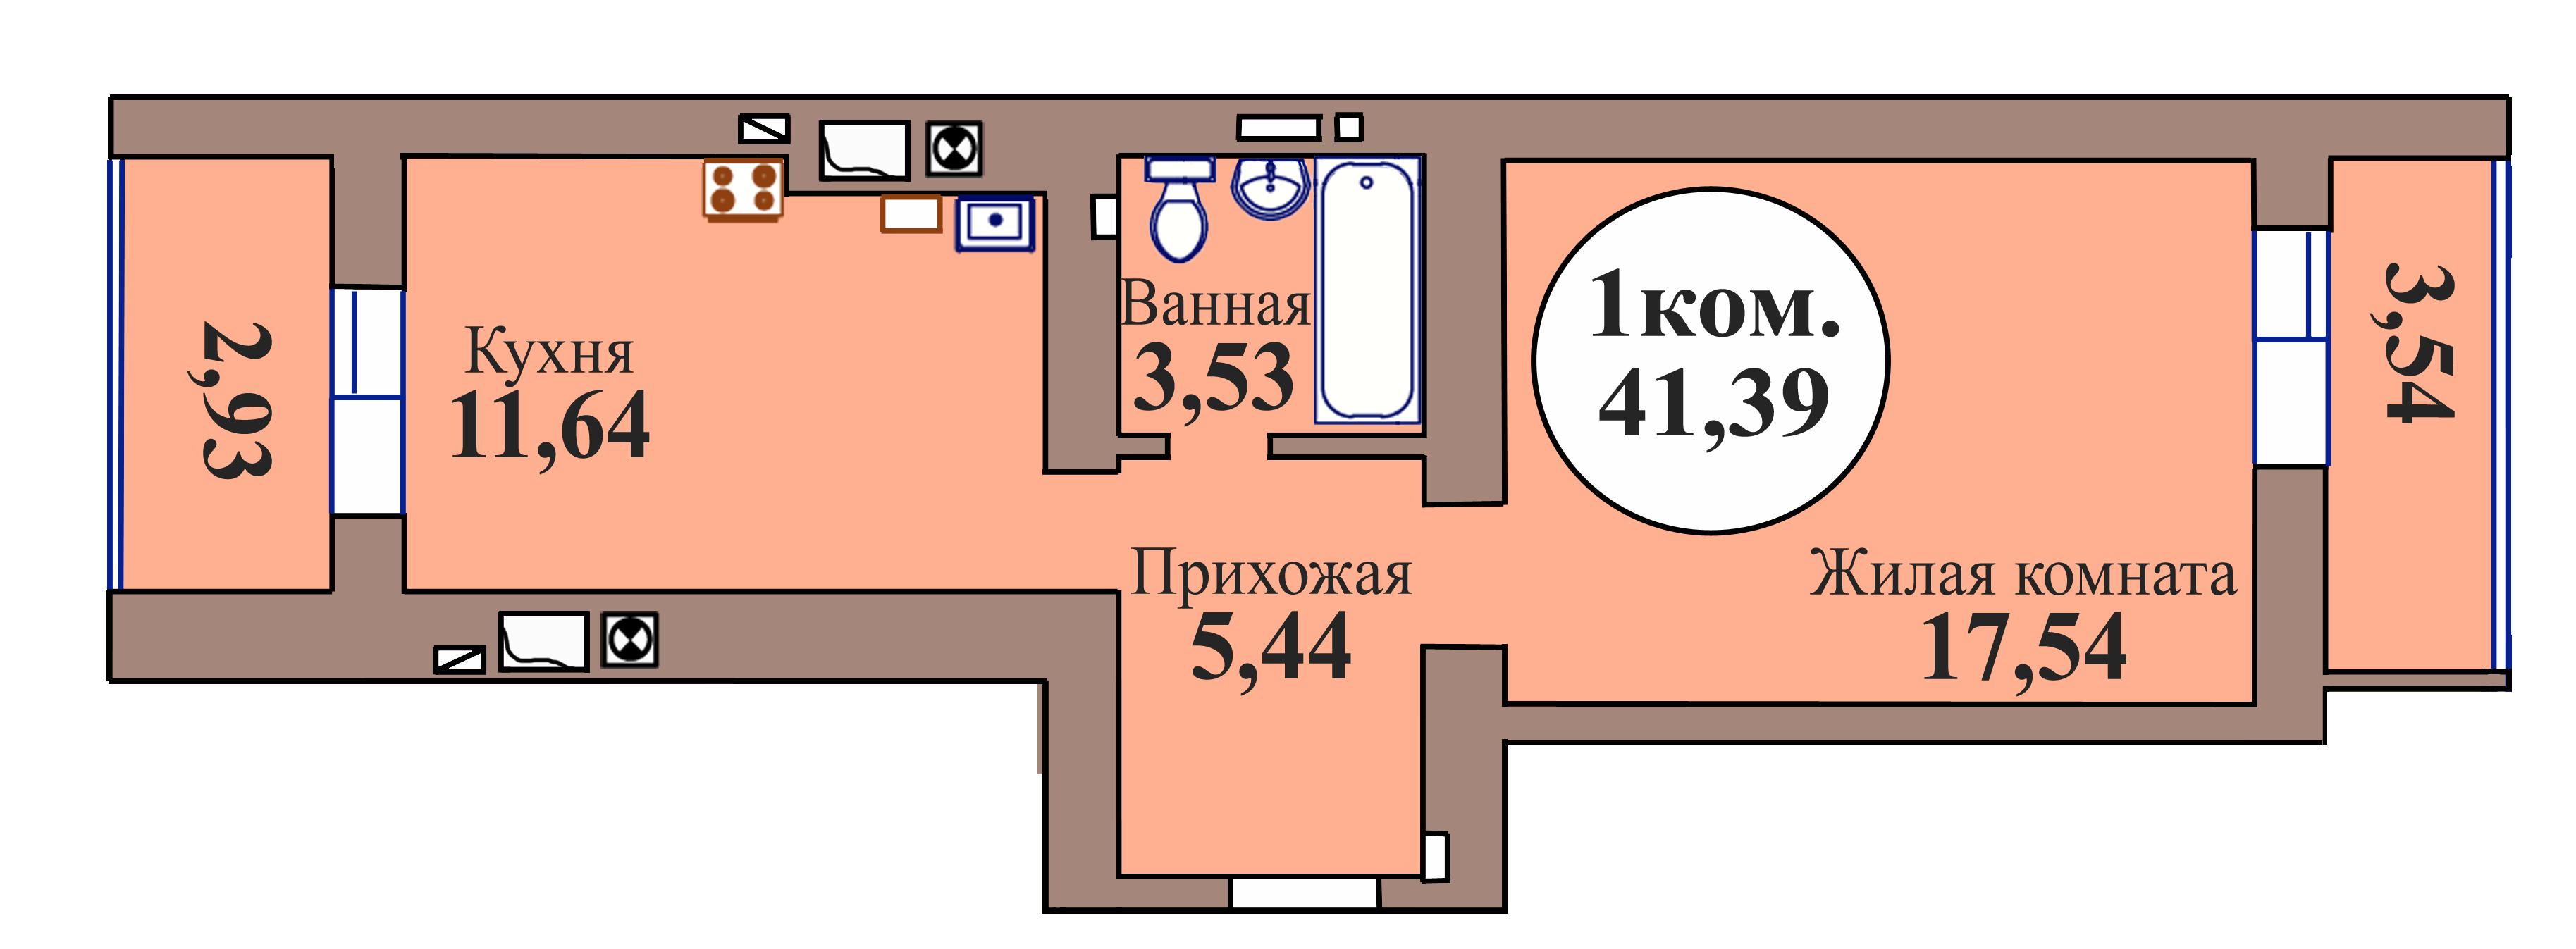 1-комн. кв. по пер. Калининградский, 5 кв. 15 в Калининграде